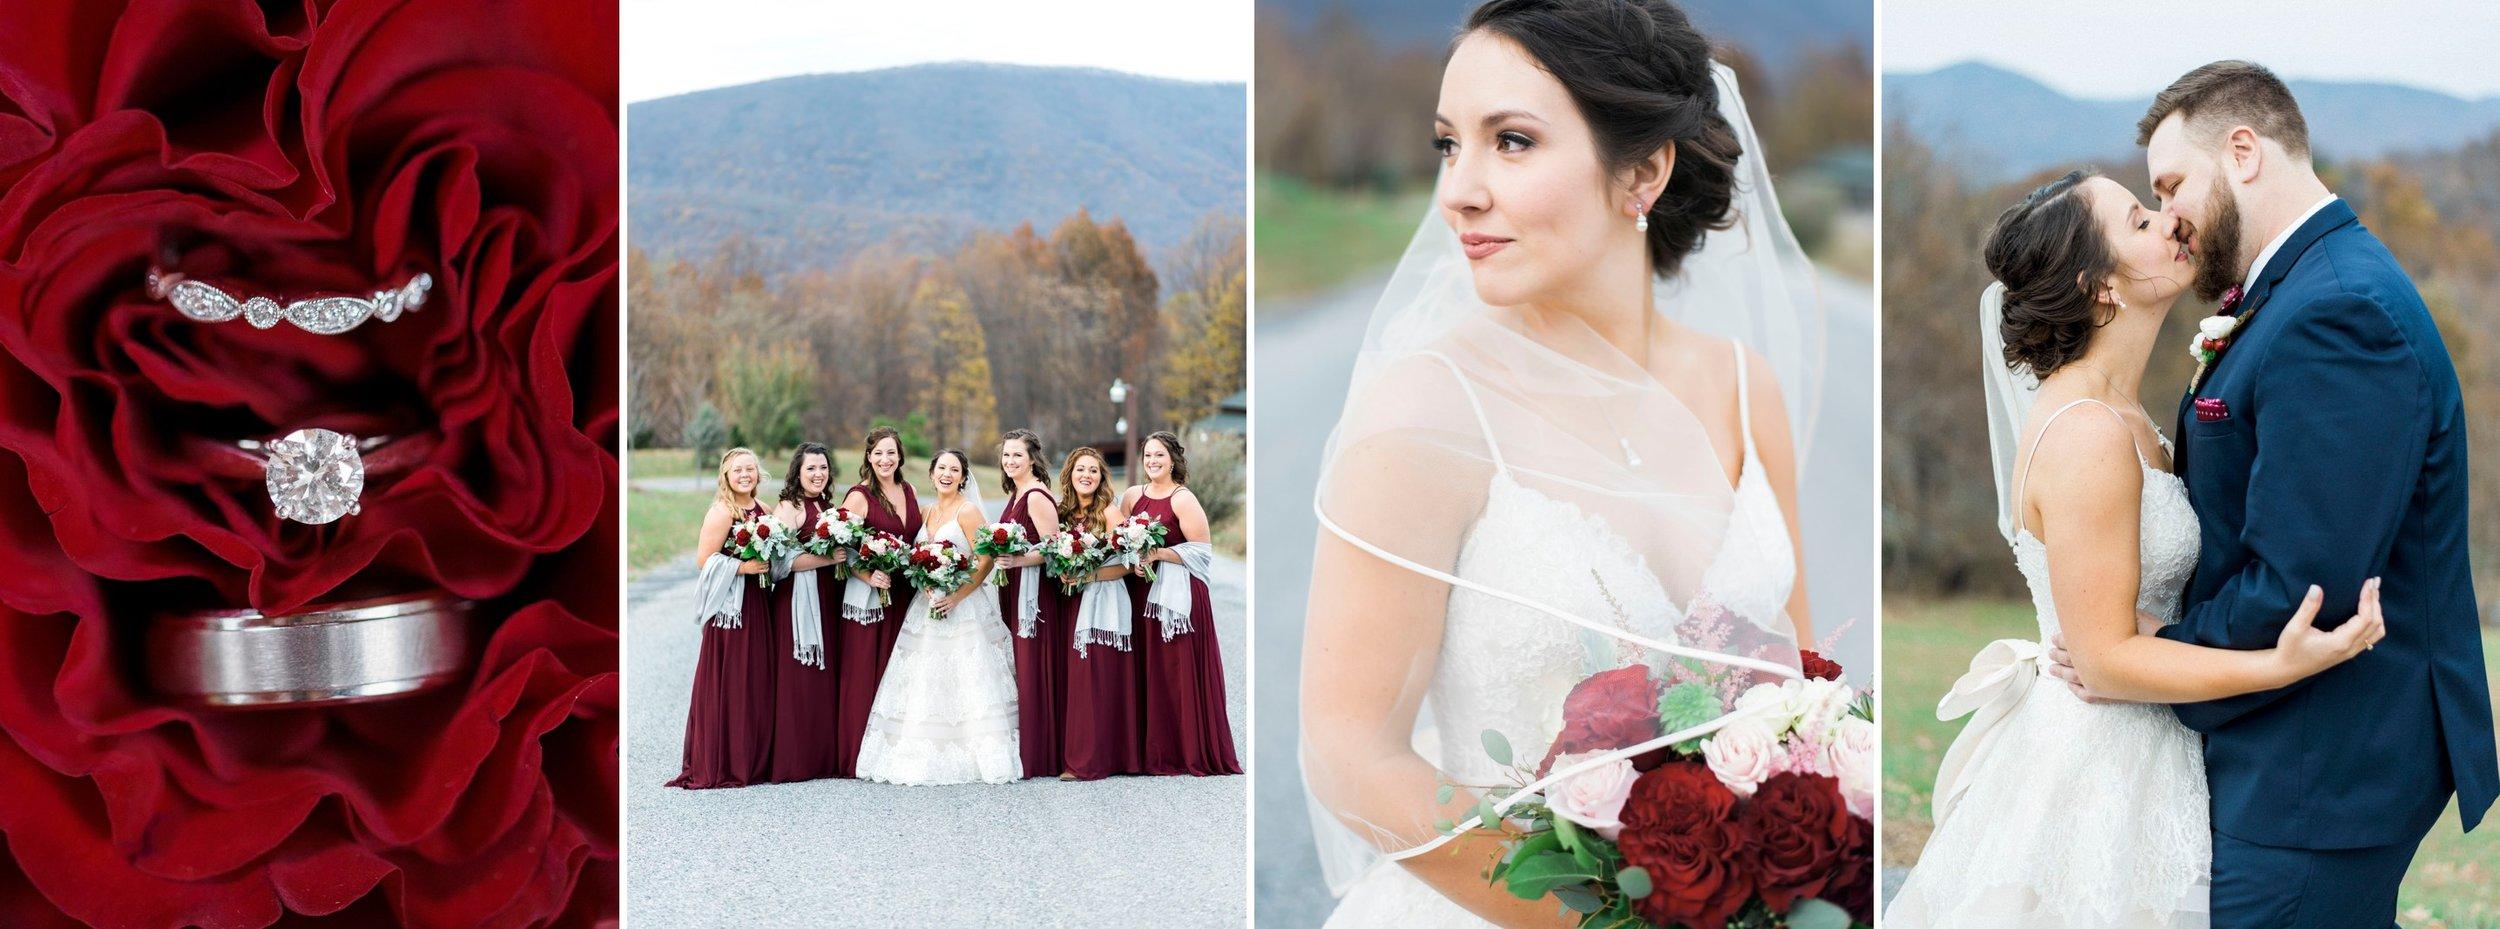 IrvineEstate_LexingtonVA_Wedding_FallWedding_VirginiaWeddingPhotographer 2.jpg